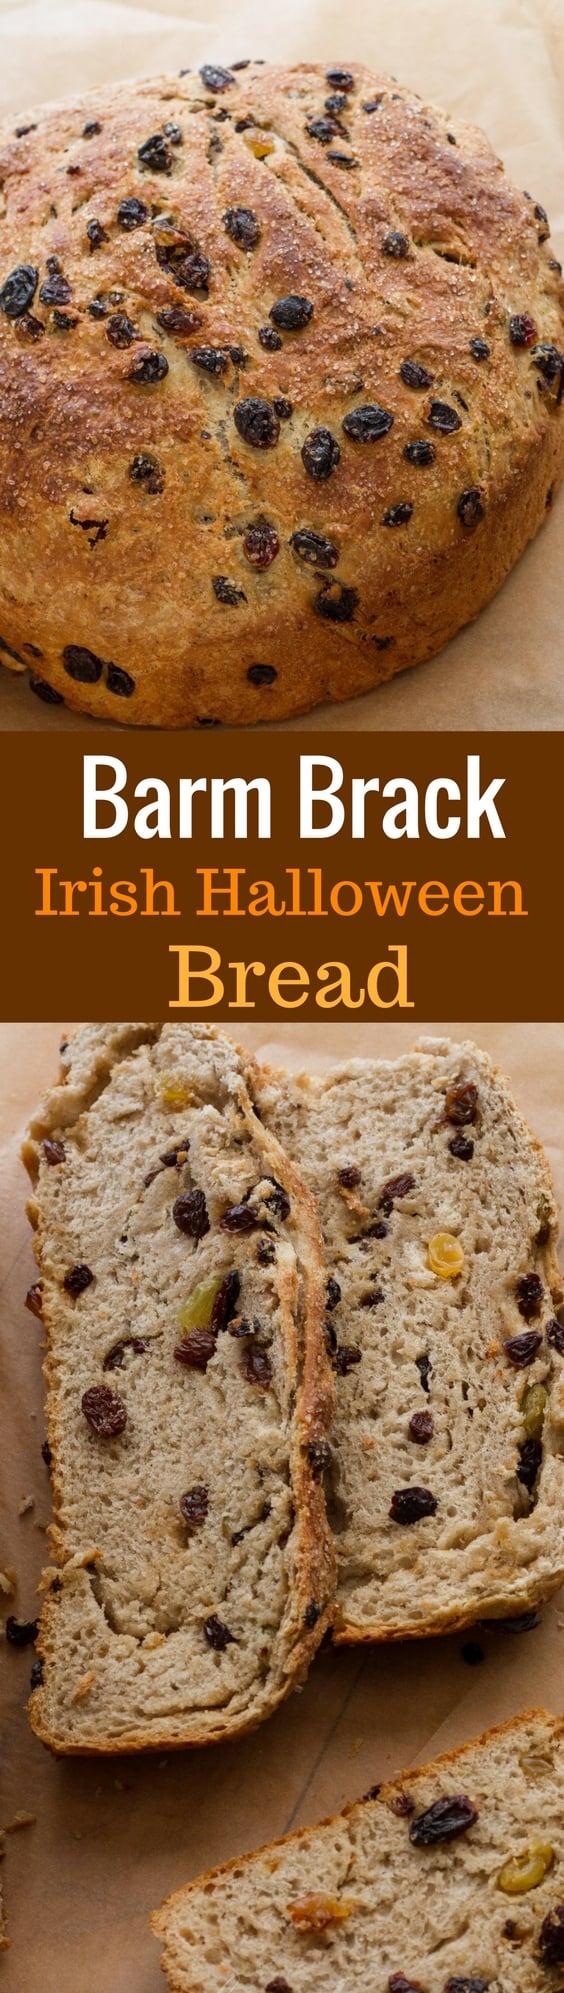 Barm Brack - Irish Halloween Bread - a little sweeter than sandwich bread, but not as rich as cake | www.savingdessert.com